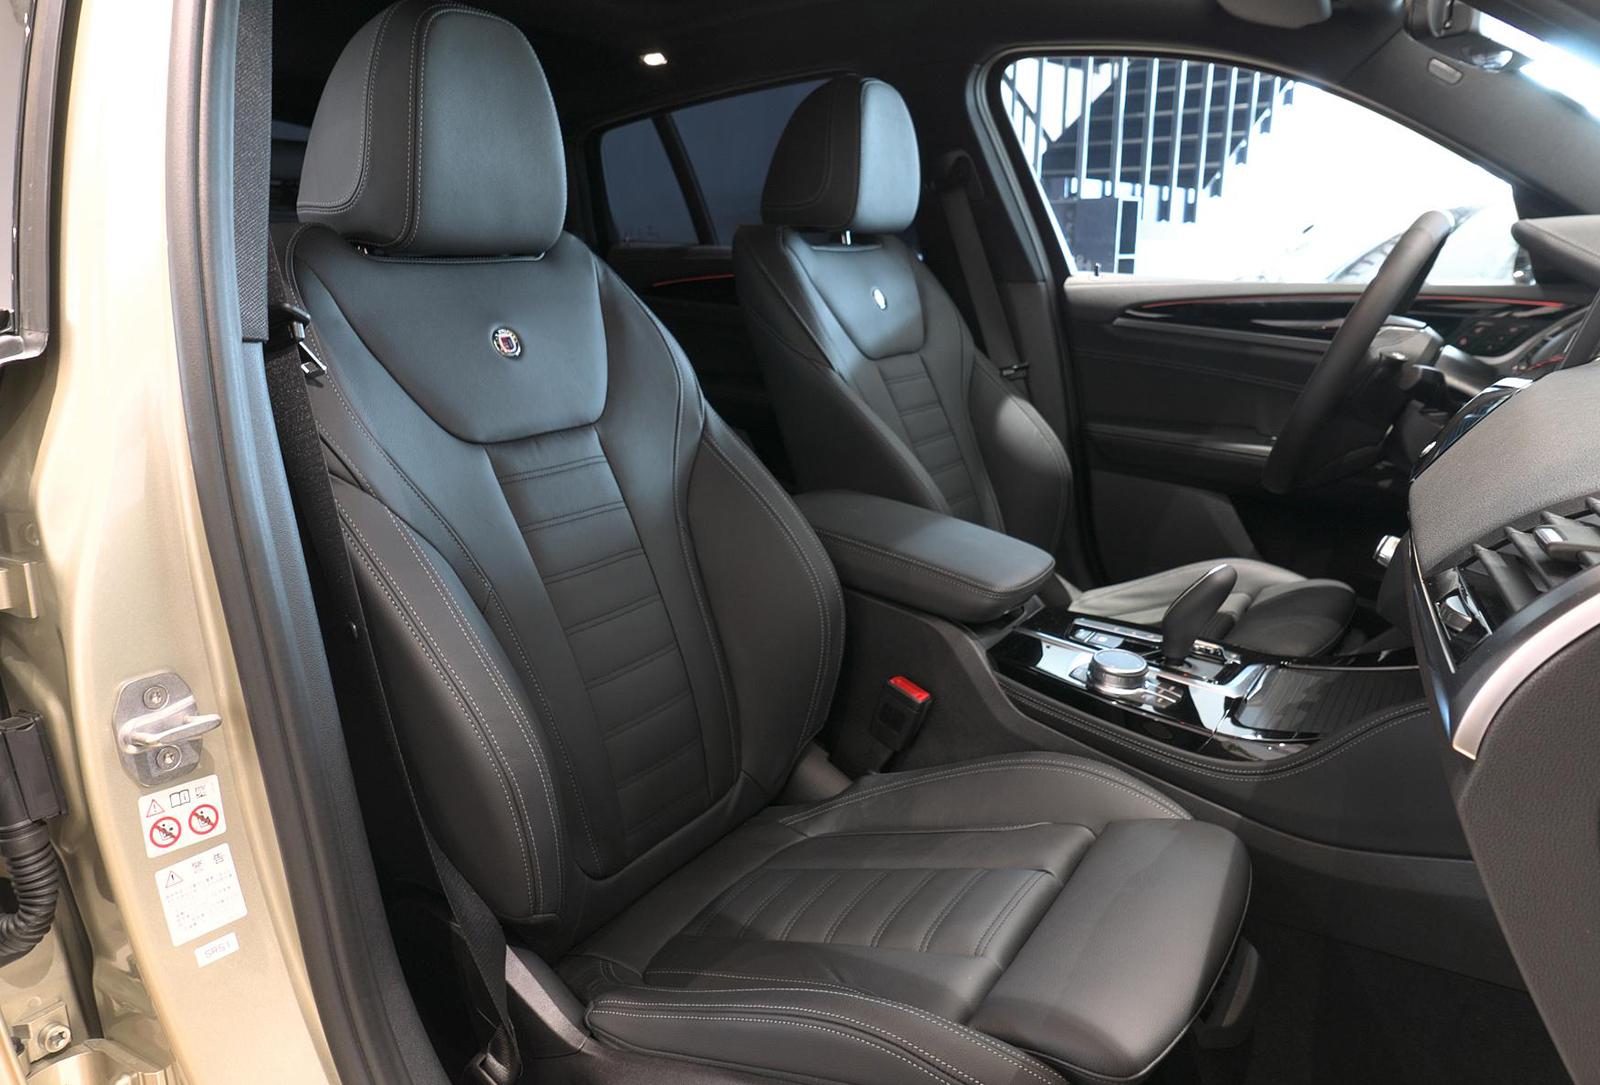 BMW アルピナ XD4 Allrad 助手席シート